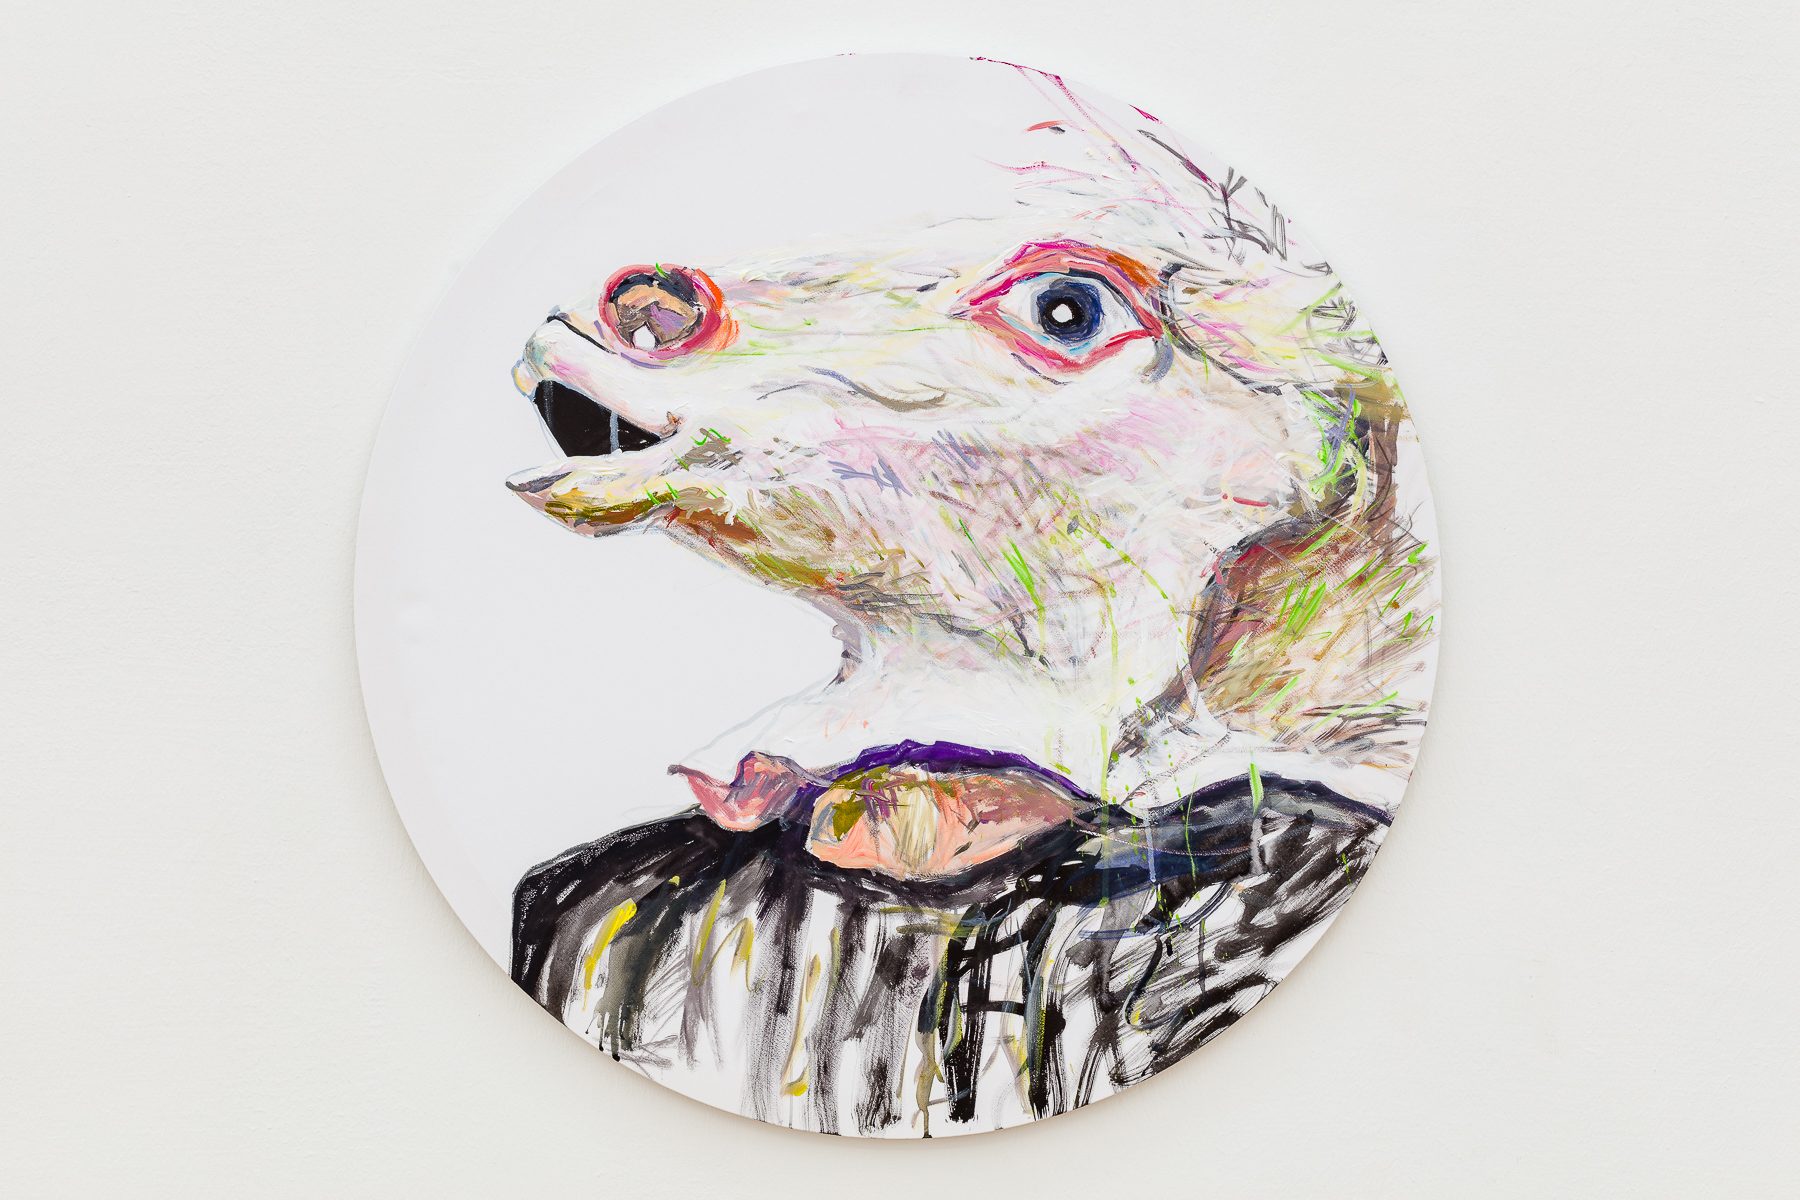 2019_05_20_Elke-Krystufek_Croy-Nielsen_by-kunst-dokumentation-com_028_web.jpg